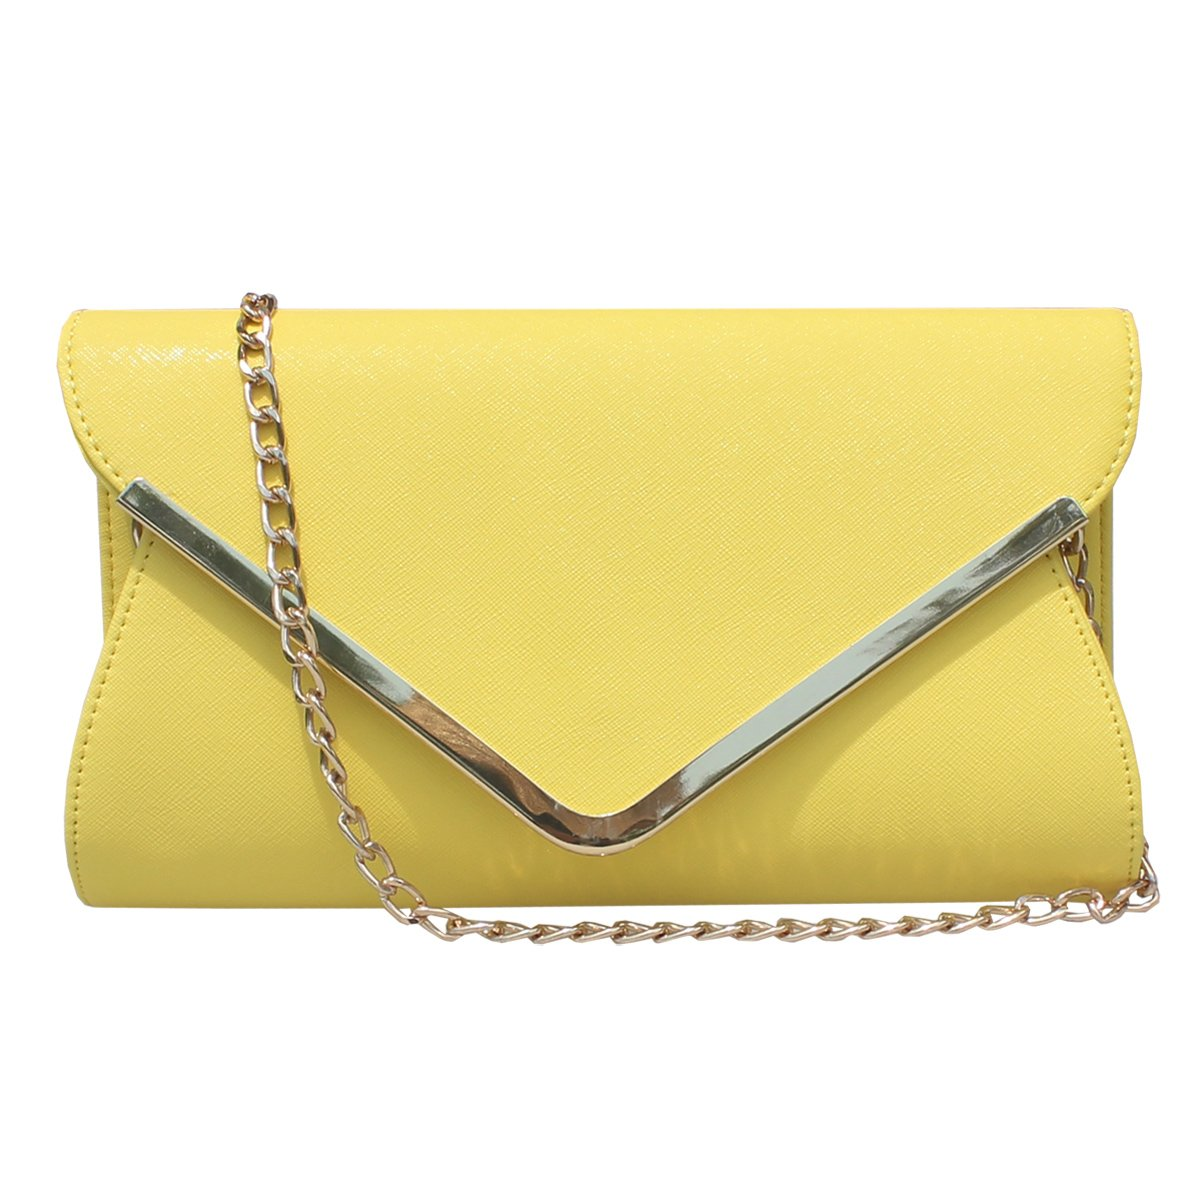 Womens Faux Leather Envelope Clutch Bag Evening Handbag Shouder Bag Wristlet Purse With Chain Strap. (Yellow)